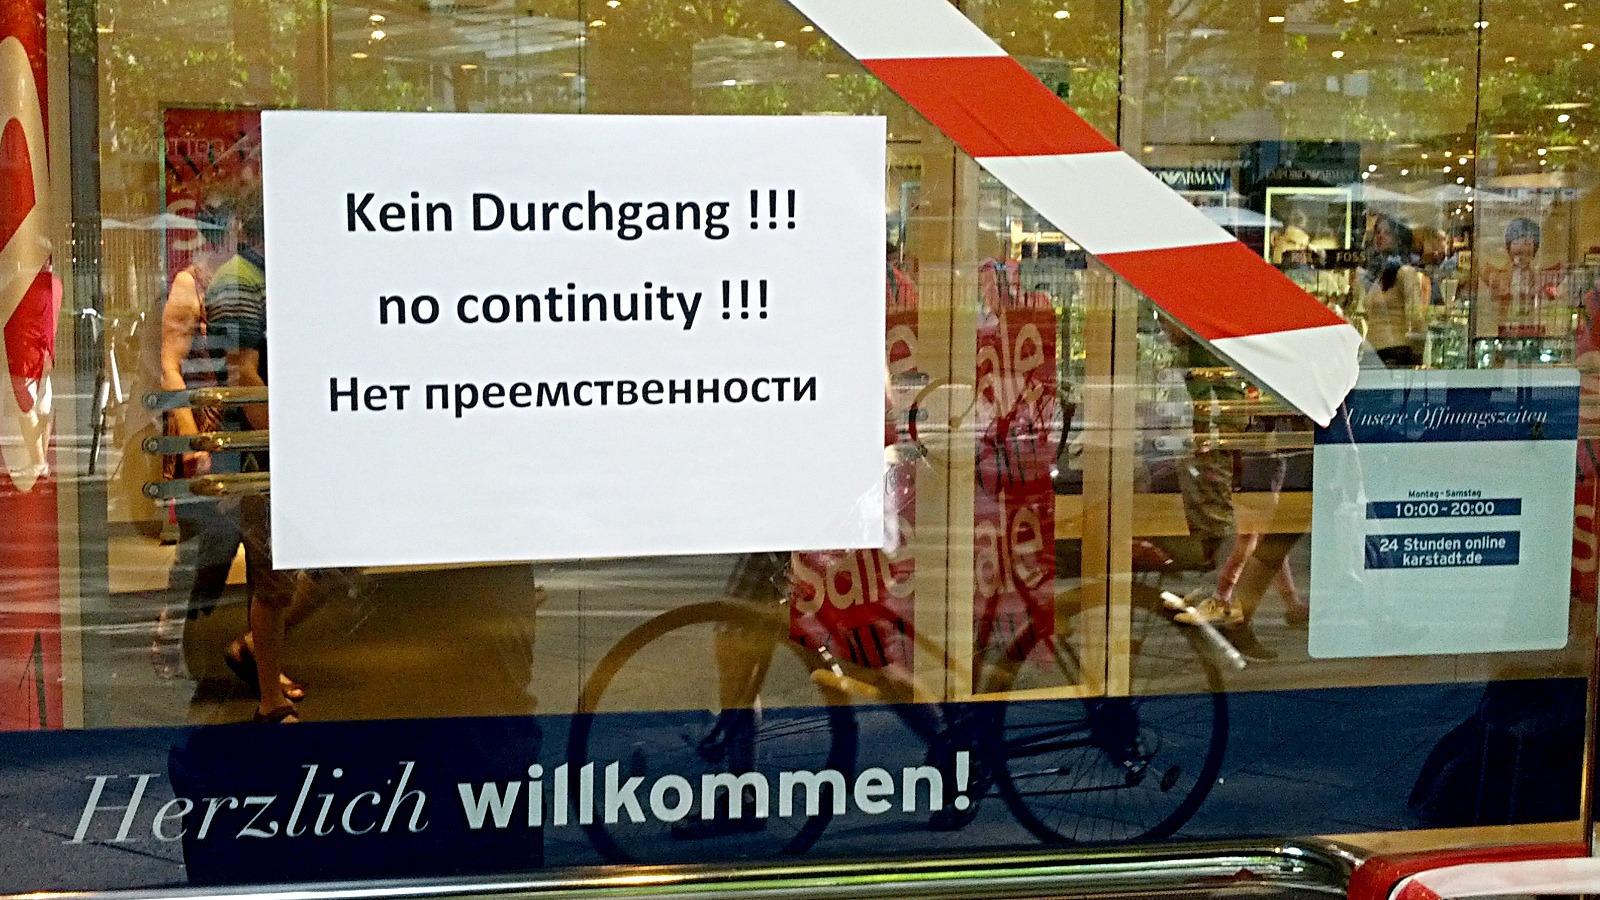 No Continuity – kein Durchgang?